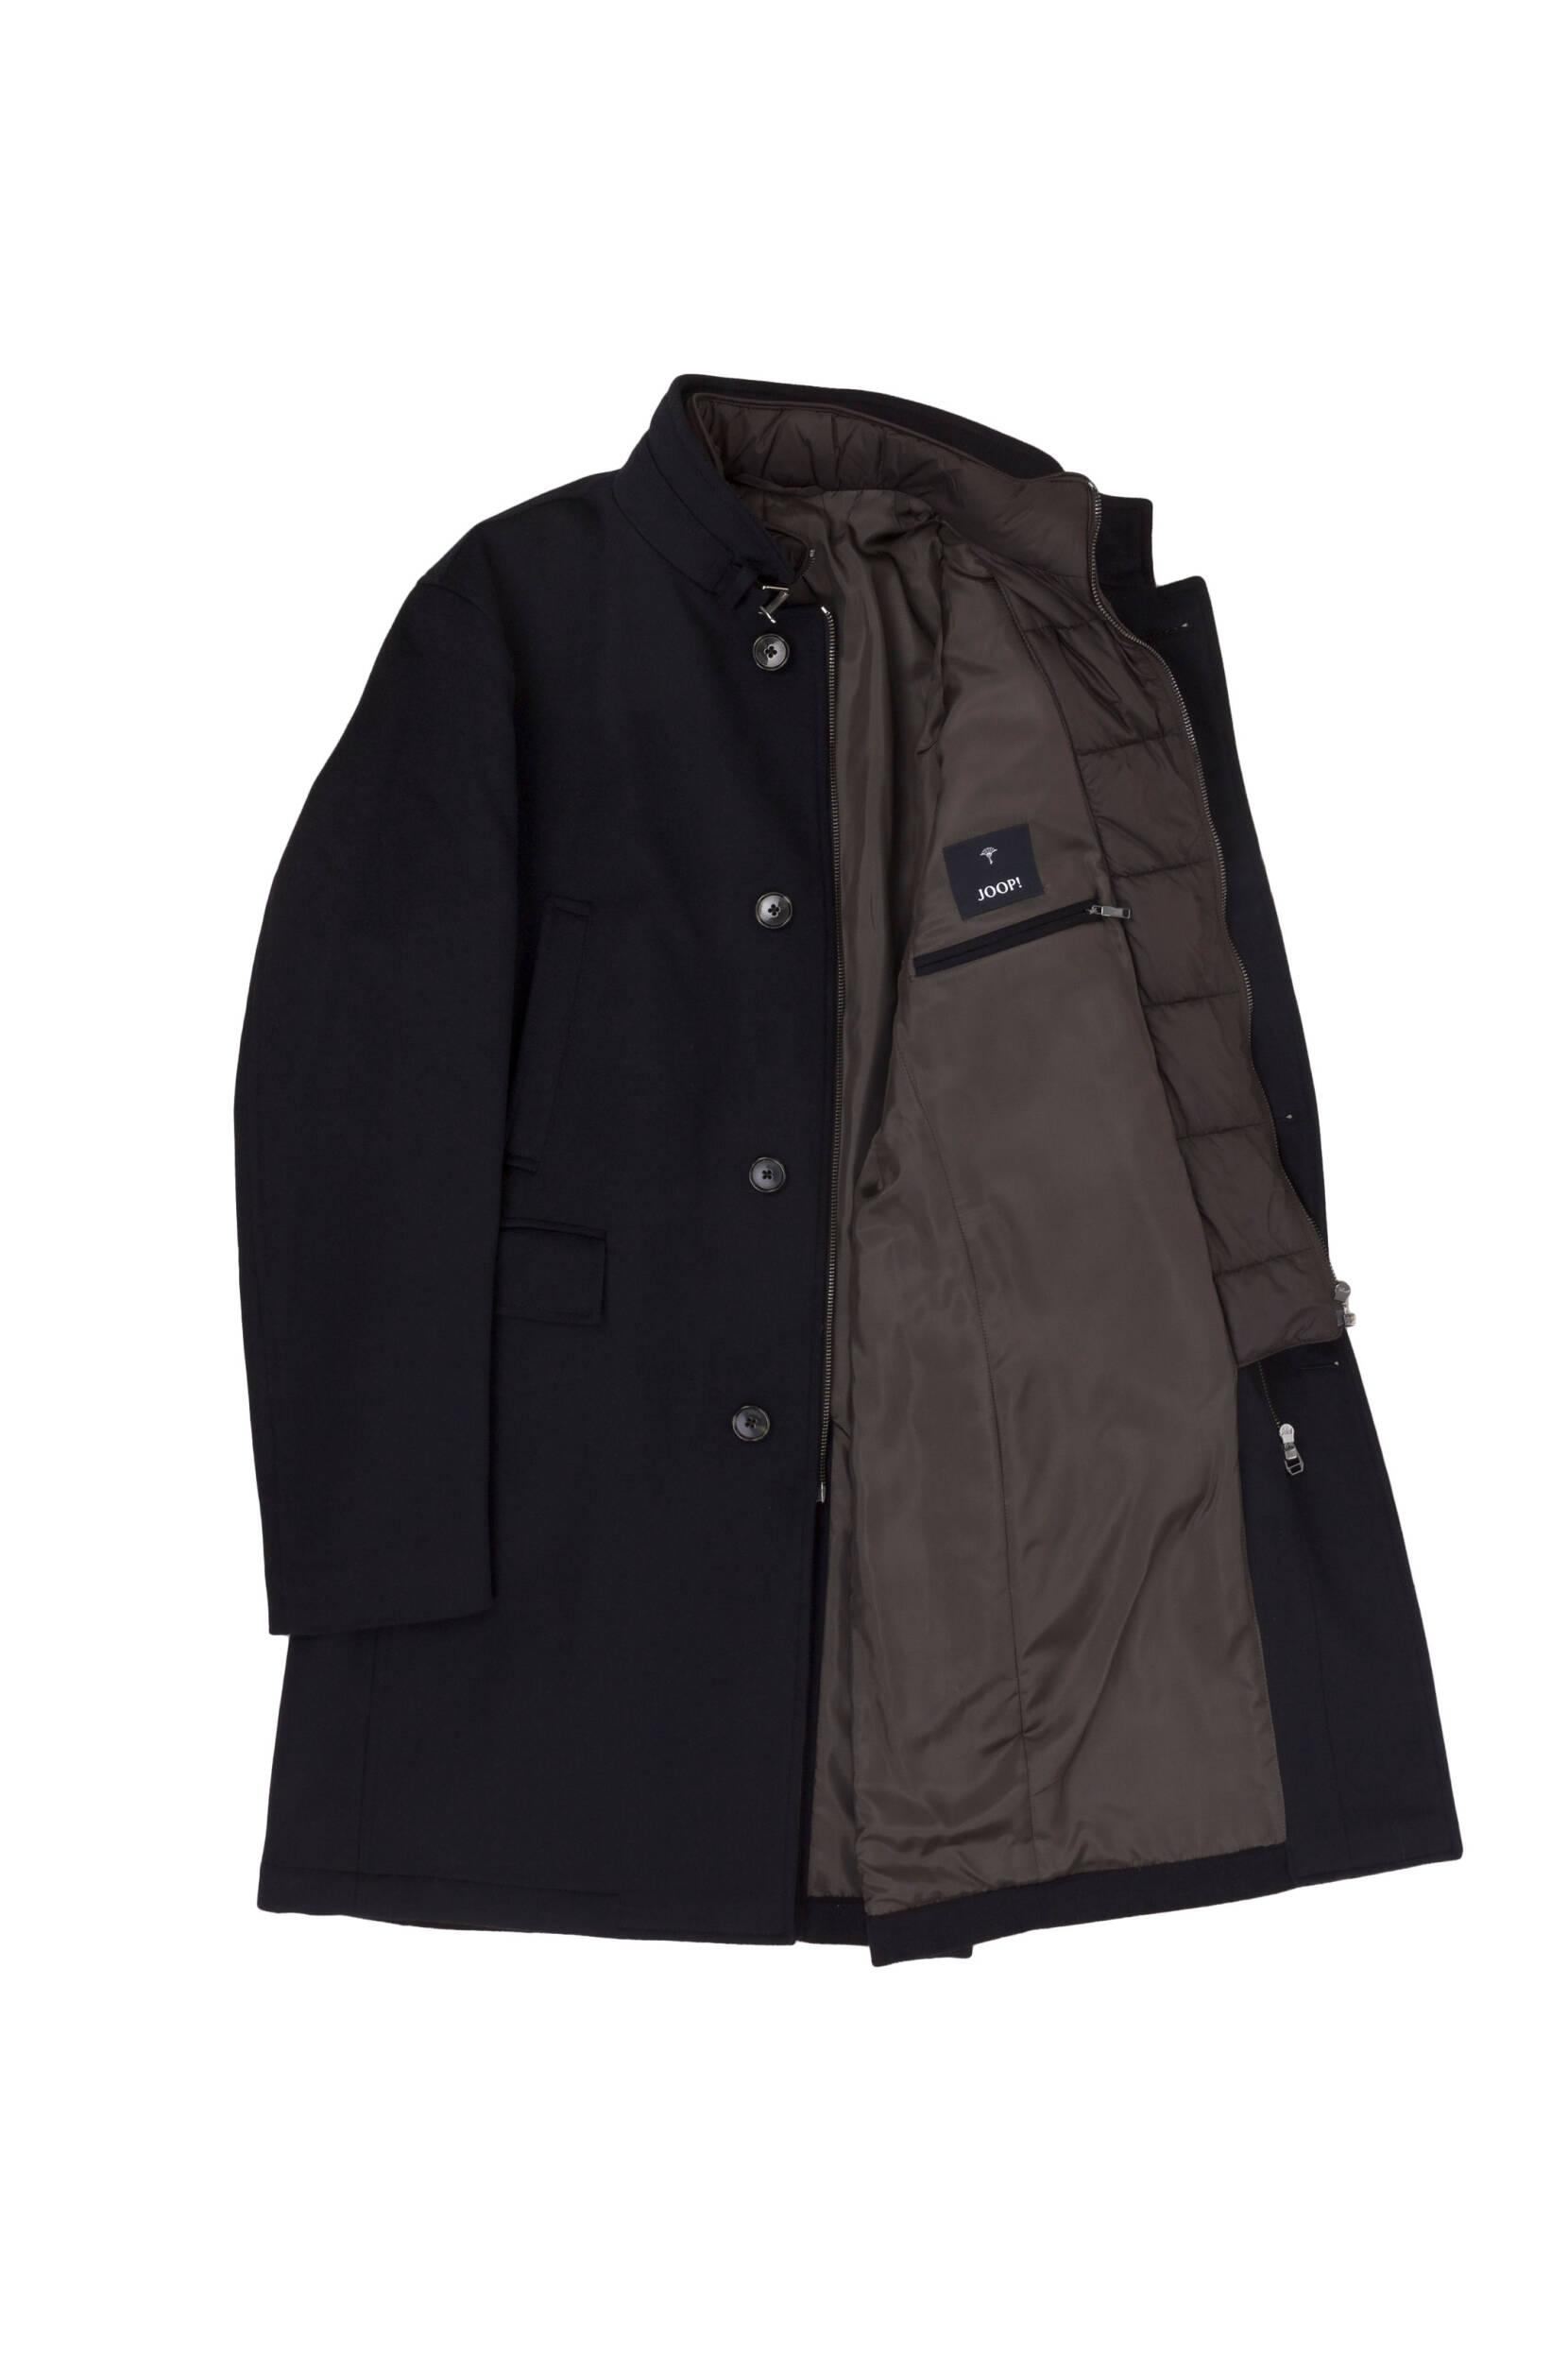 das billigste beste Schuhe bieten Rabatte Micor wool coat